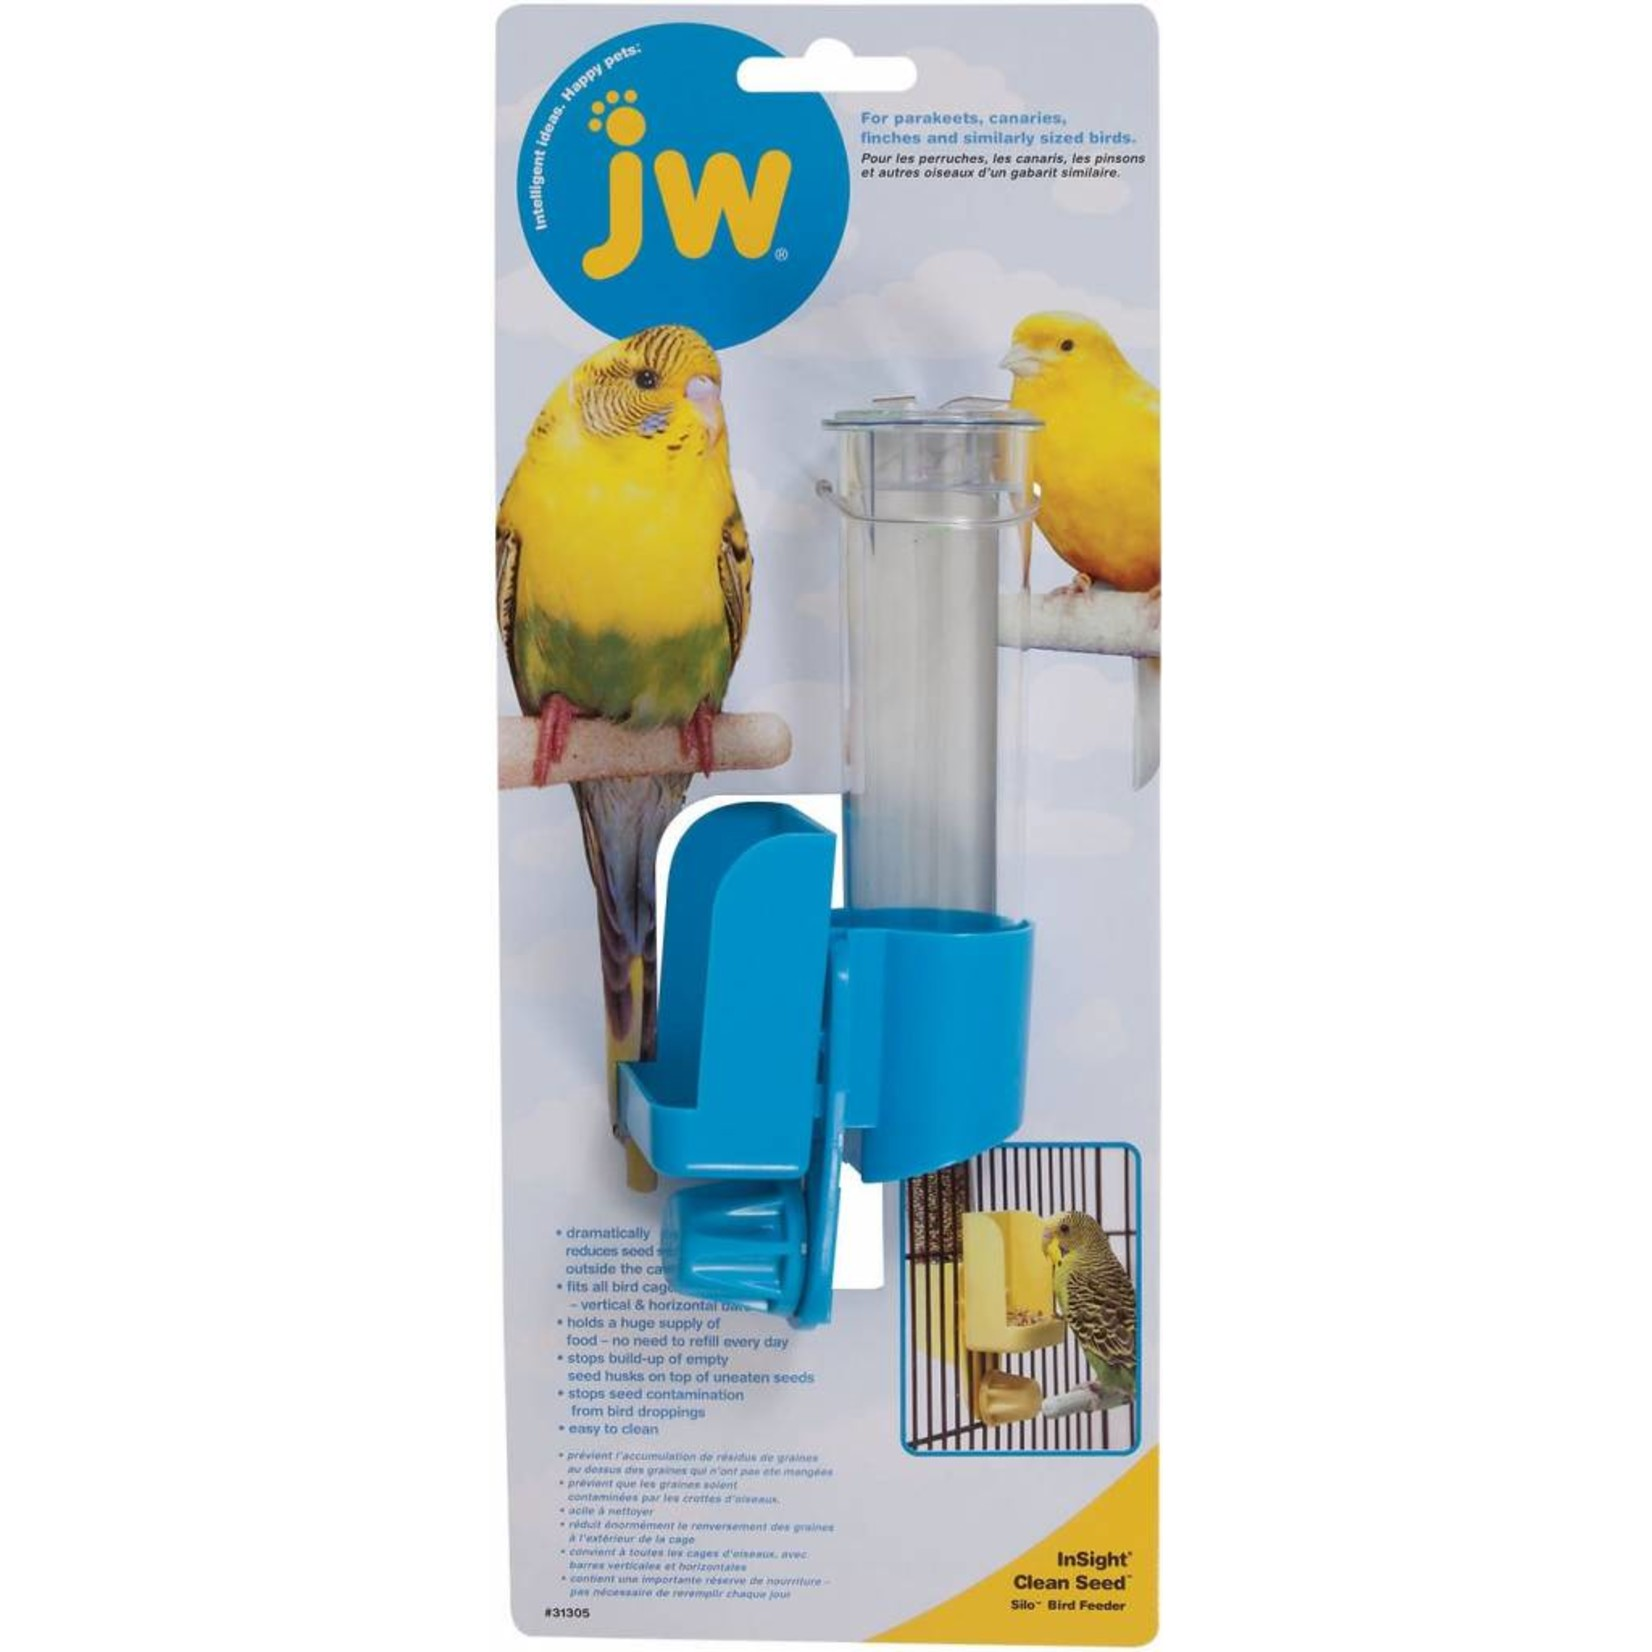 JW Clean Seed Silo Cage Bird Feeder